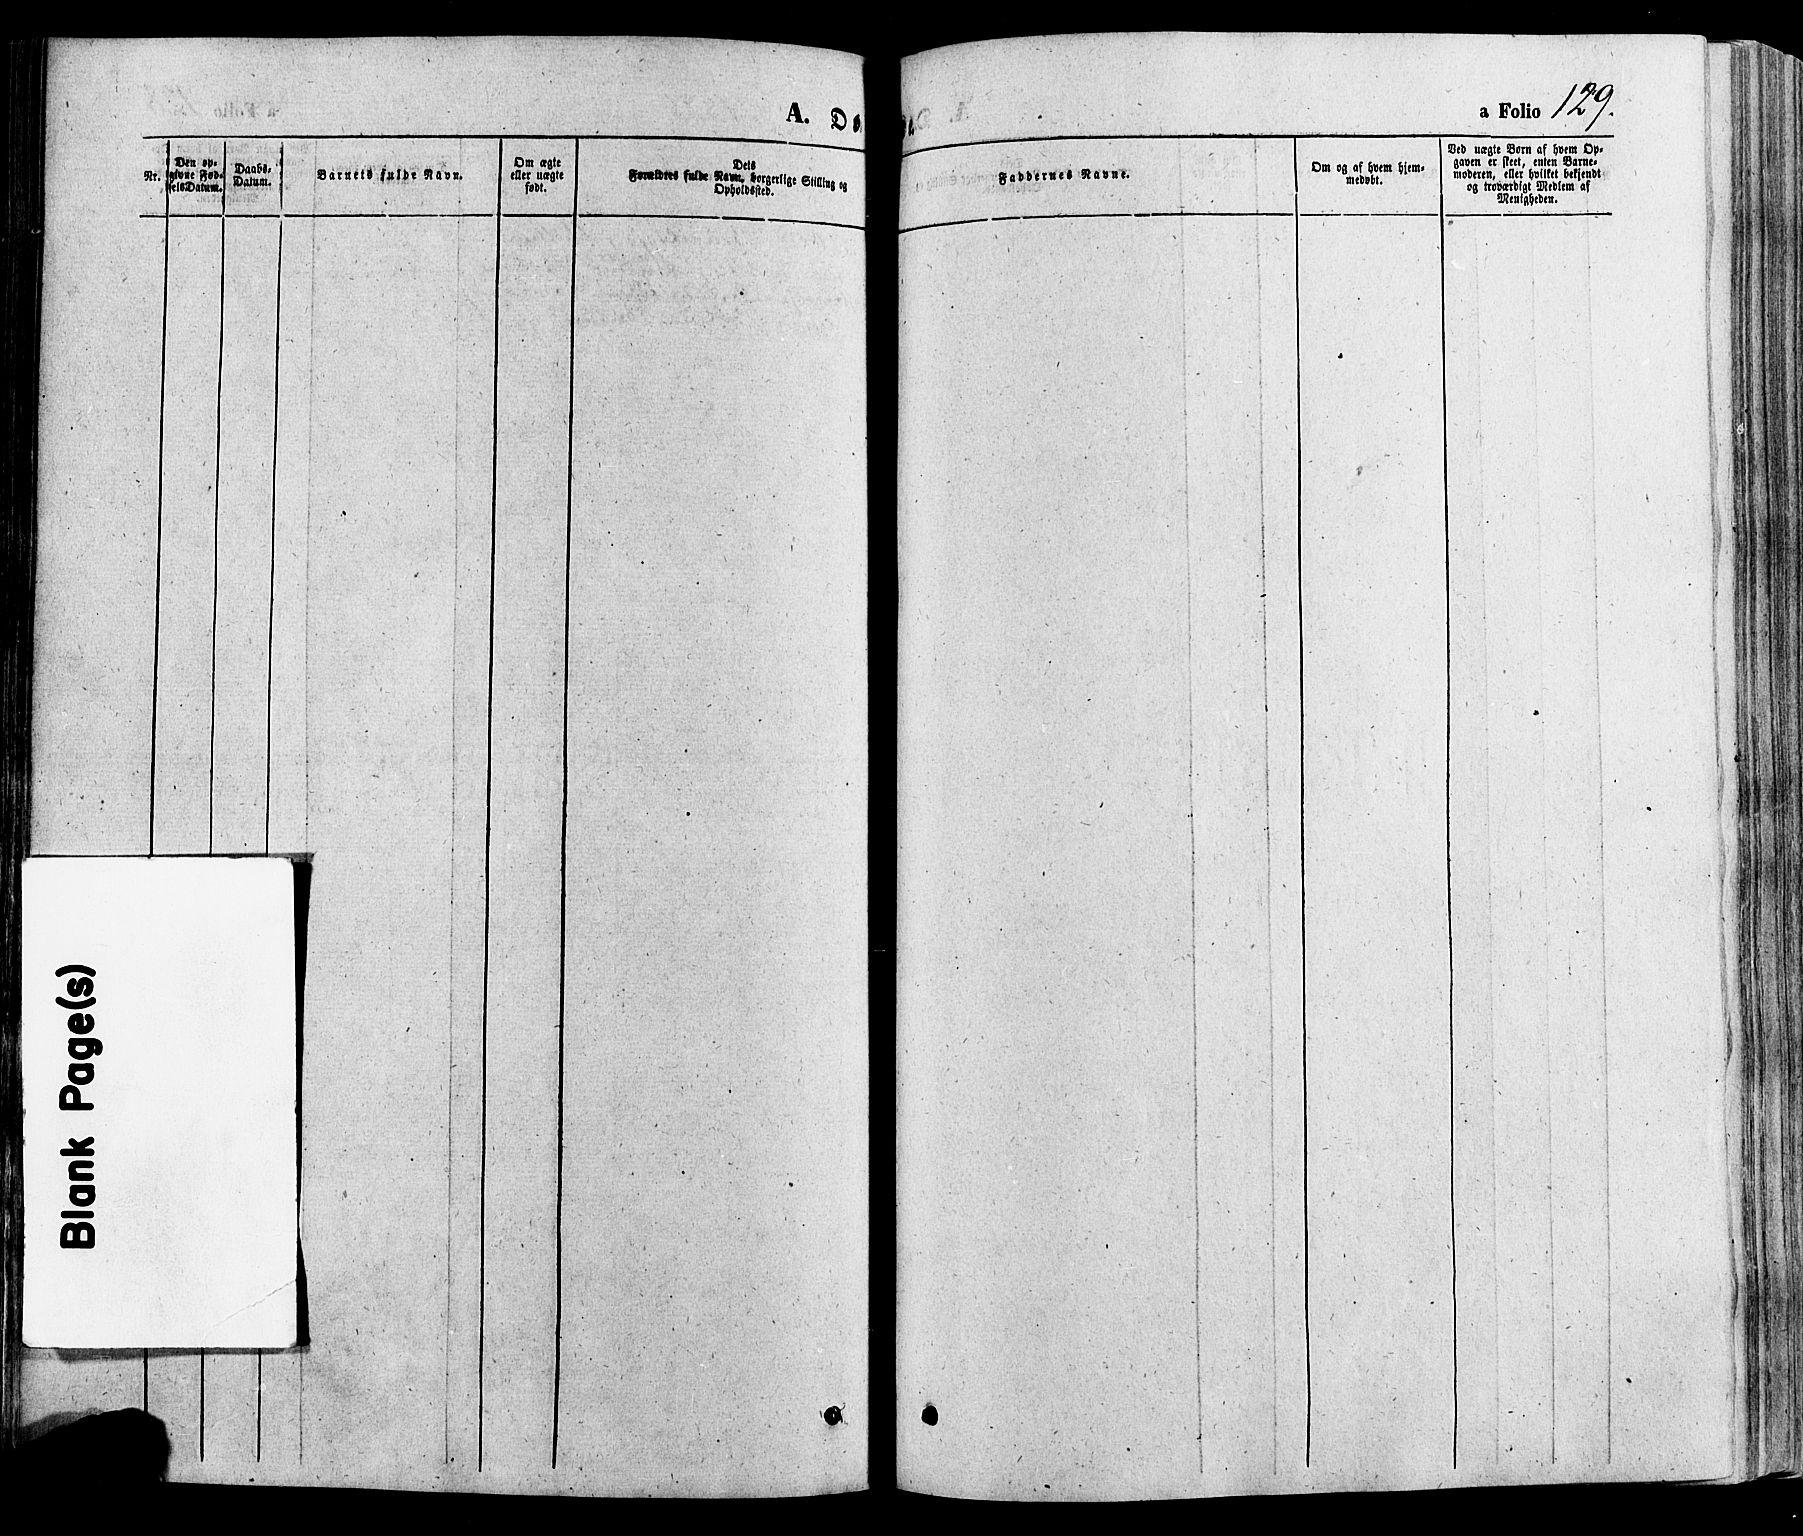 SAH, Gausdal prestekontor, Ministerialbok nr. 10, 1867-1886, s. 129